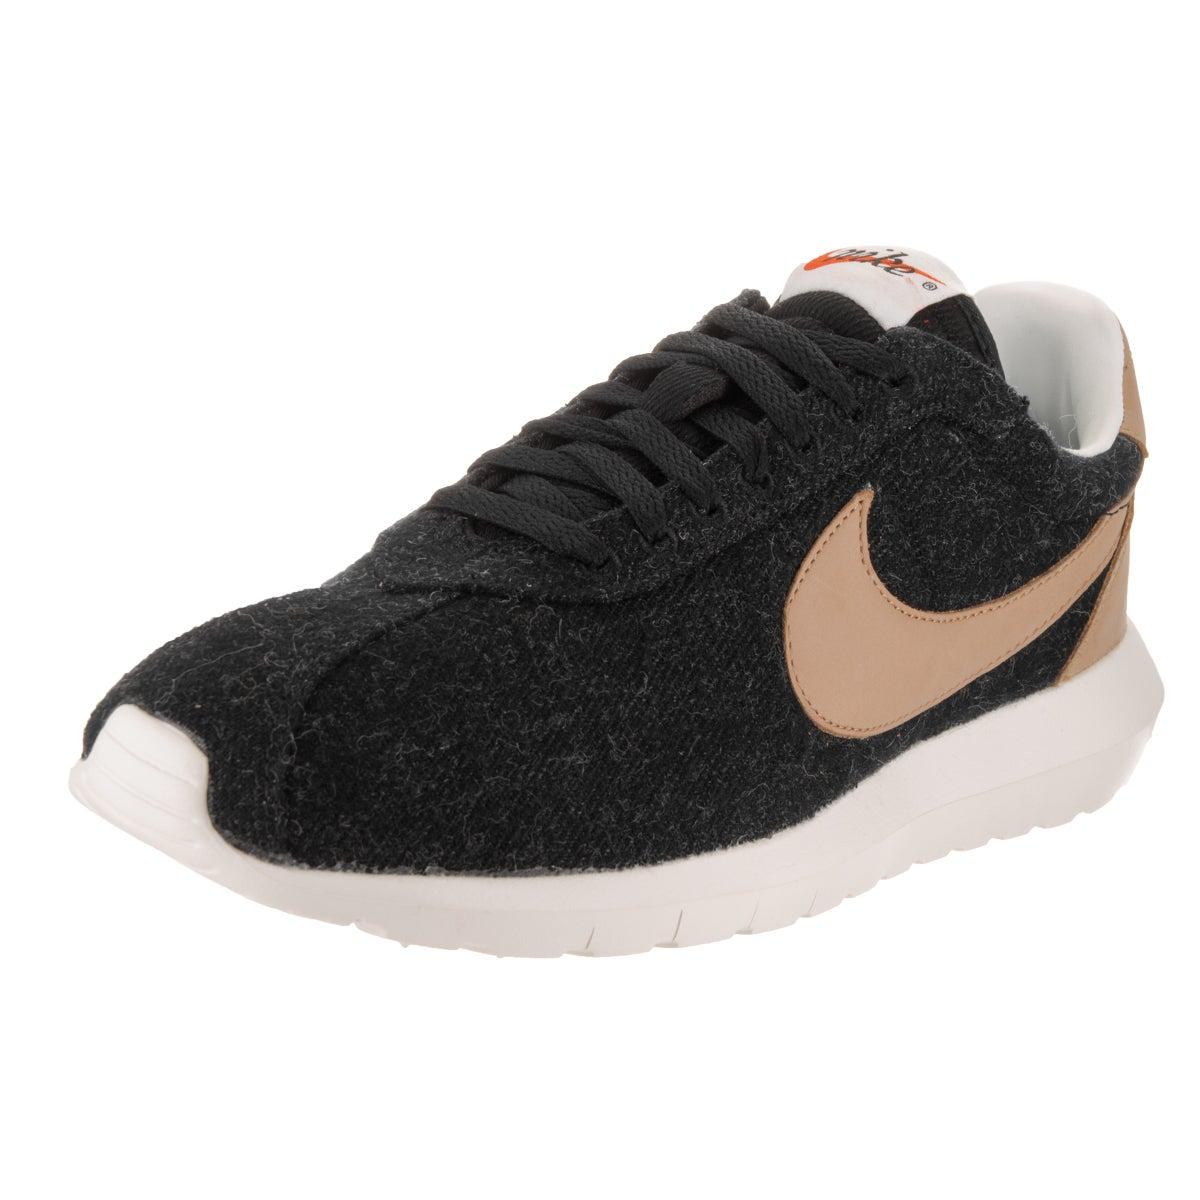 Shop Nike Men s Black Wool Roshe LD-1000 Casual Shoe - Free Shipping ... 8f34a87e6ff9